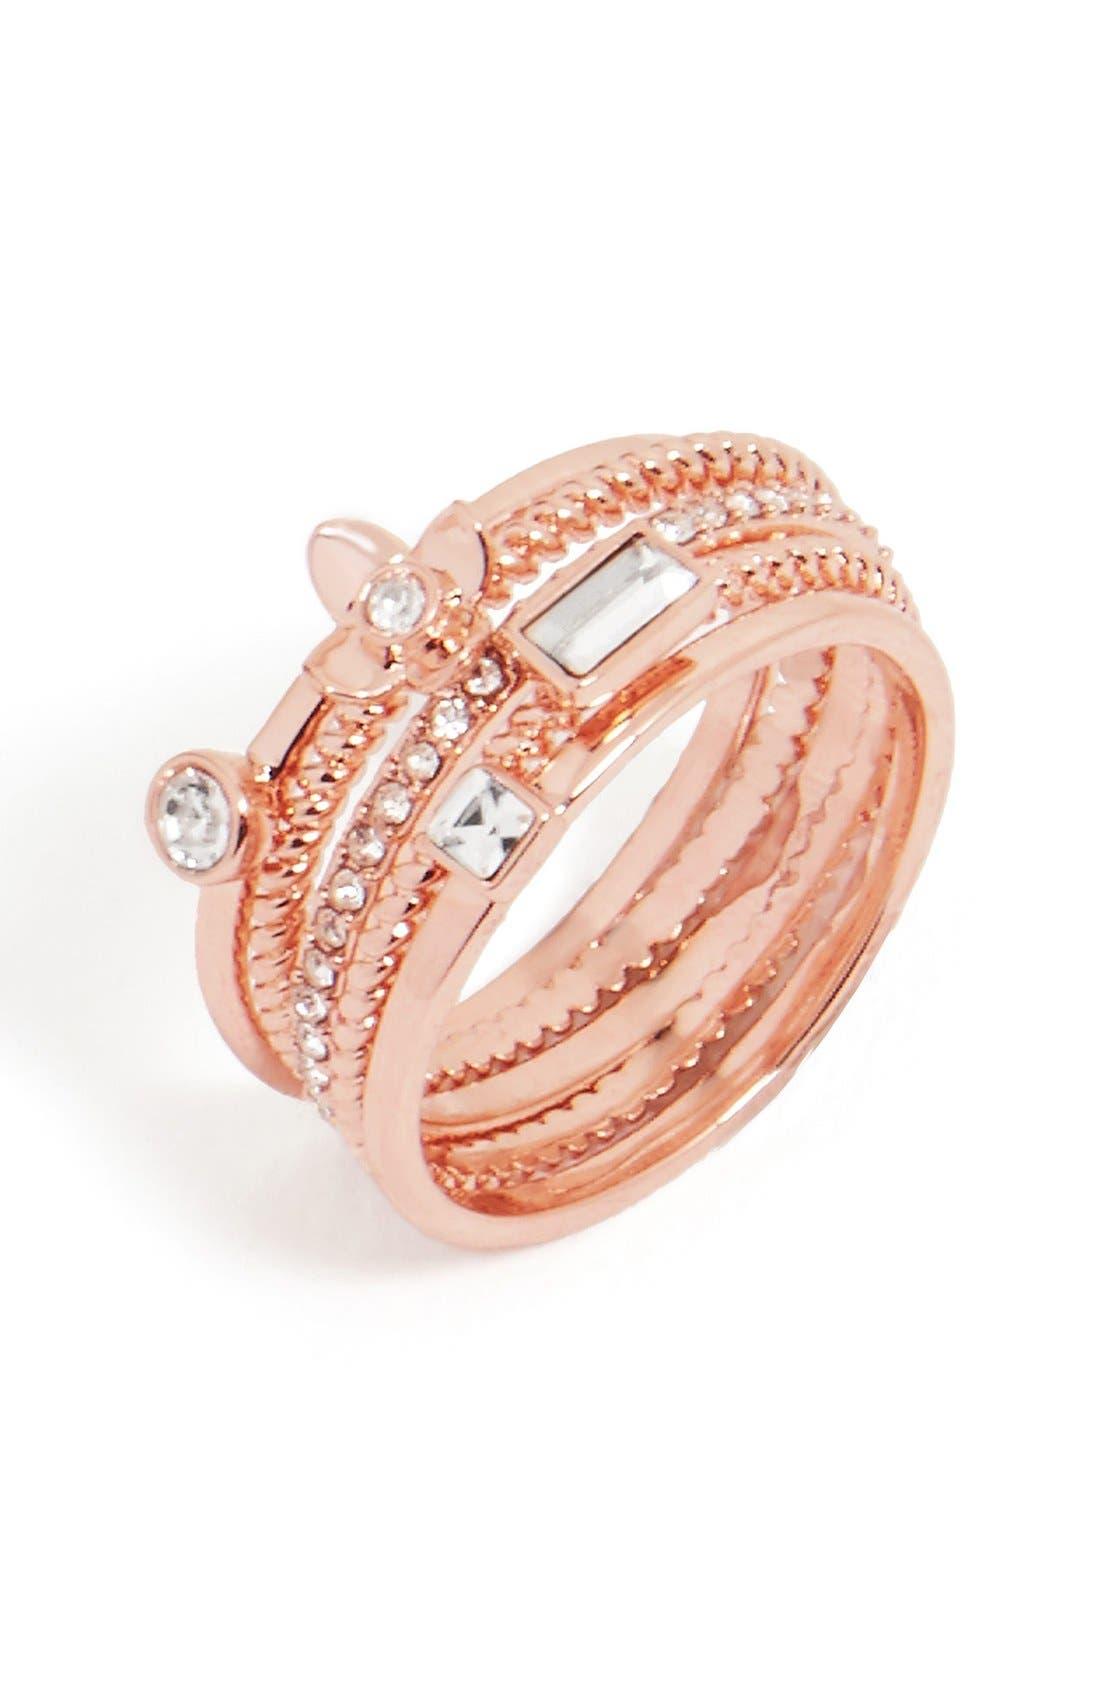 Alternate Image 1 Selected - BaubleBar 'Rosalba' Crystal Rings (Set of 5)